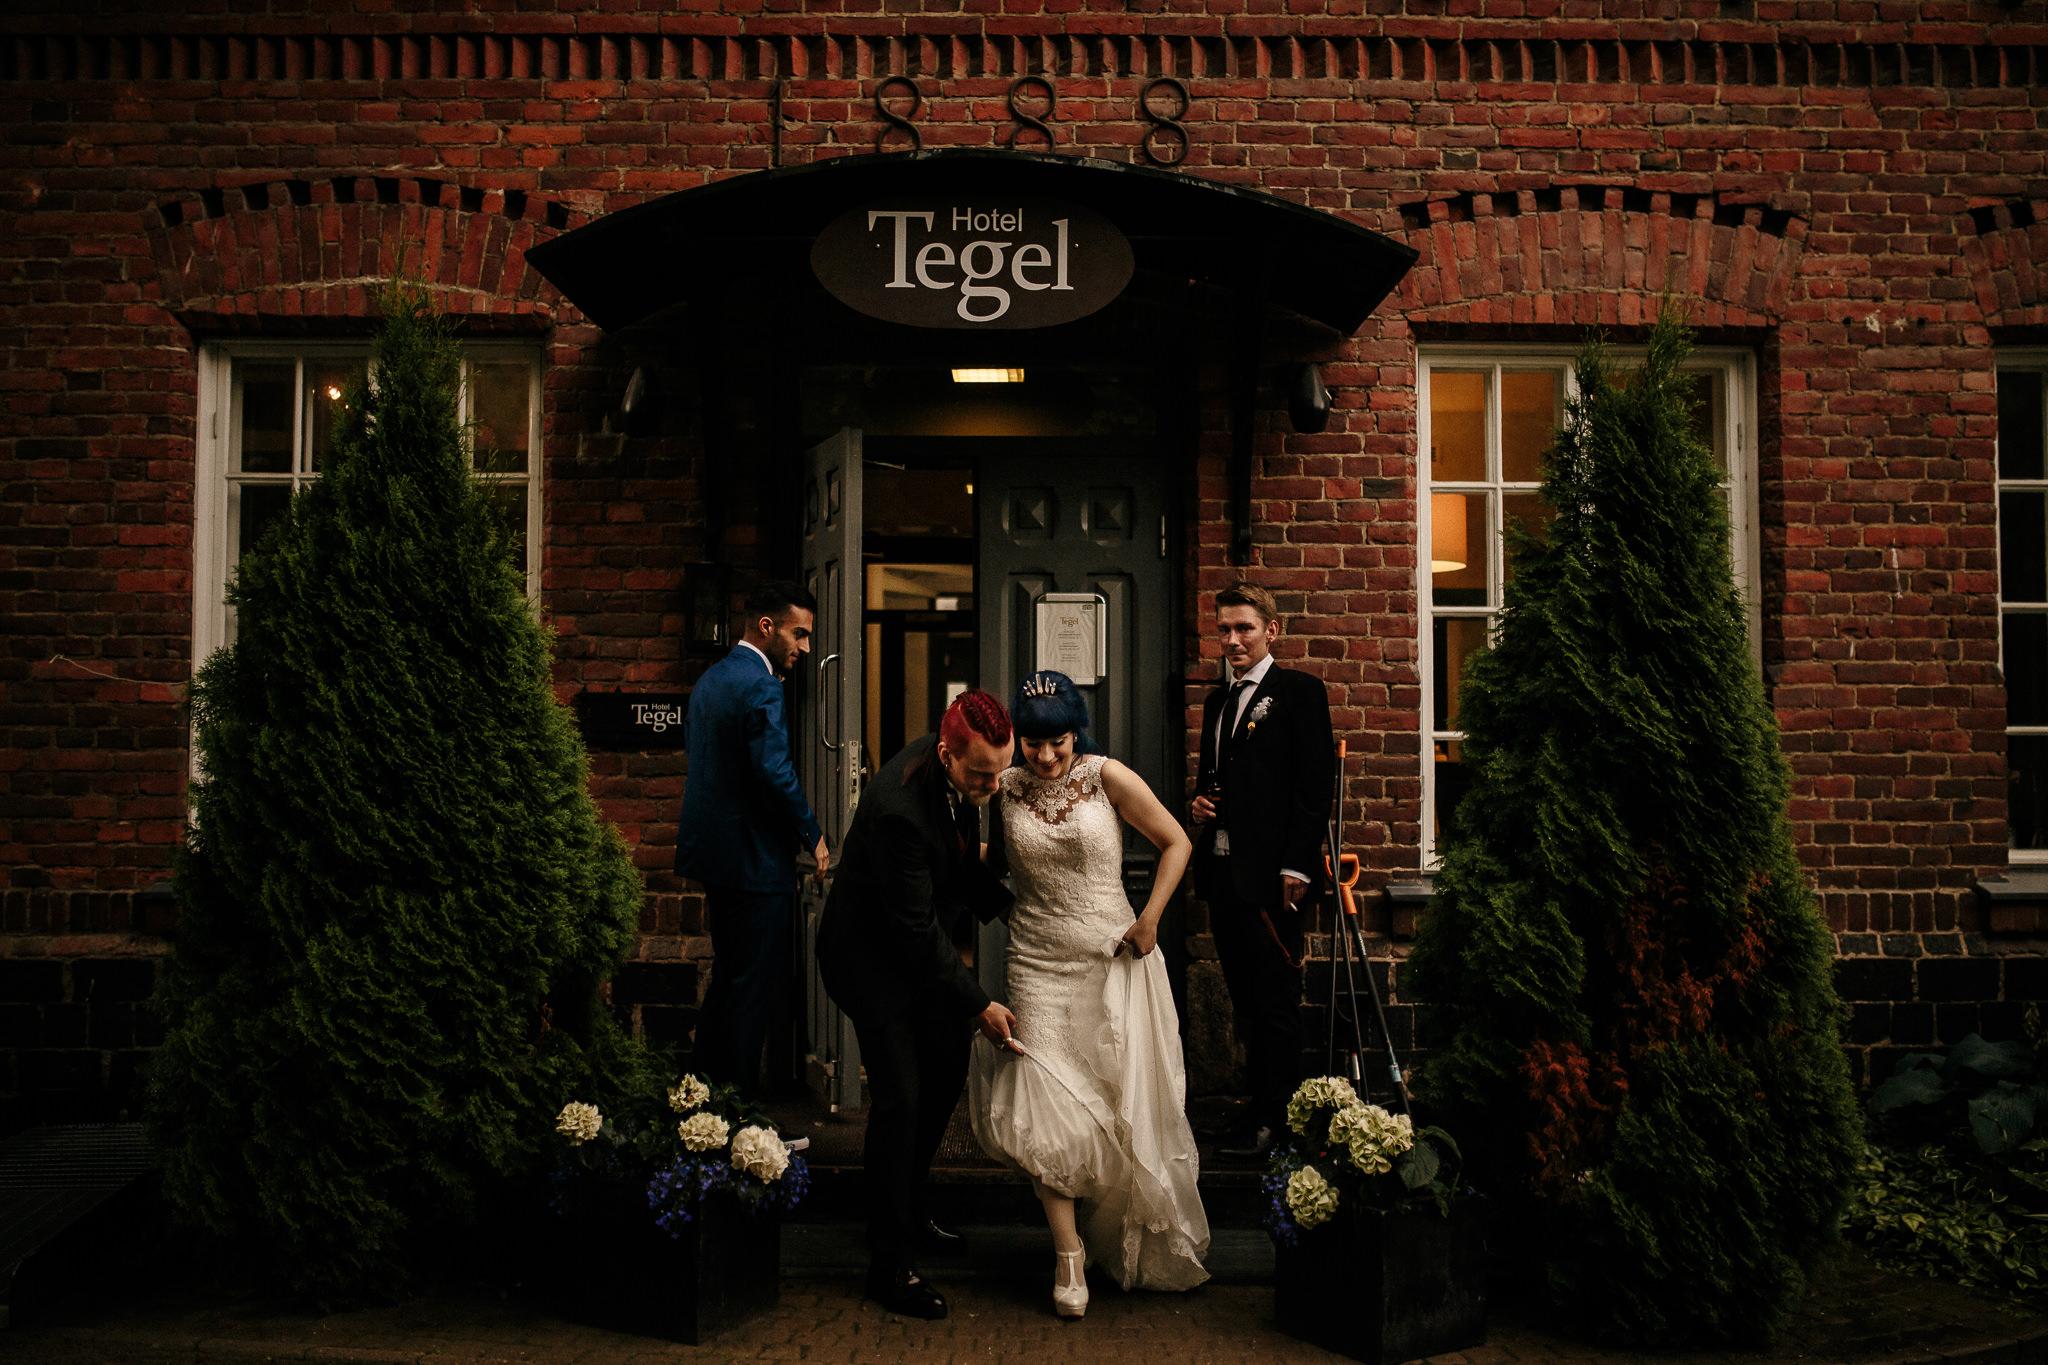 Ceren & Jani - Finland Wedding Photographer - Weddings by Qay - Wedding Photographer (31 of 166).jpg